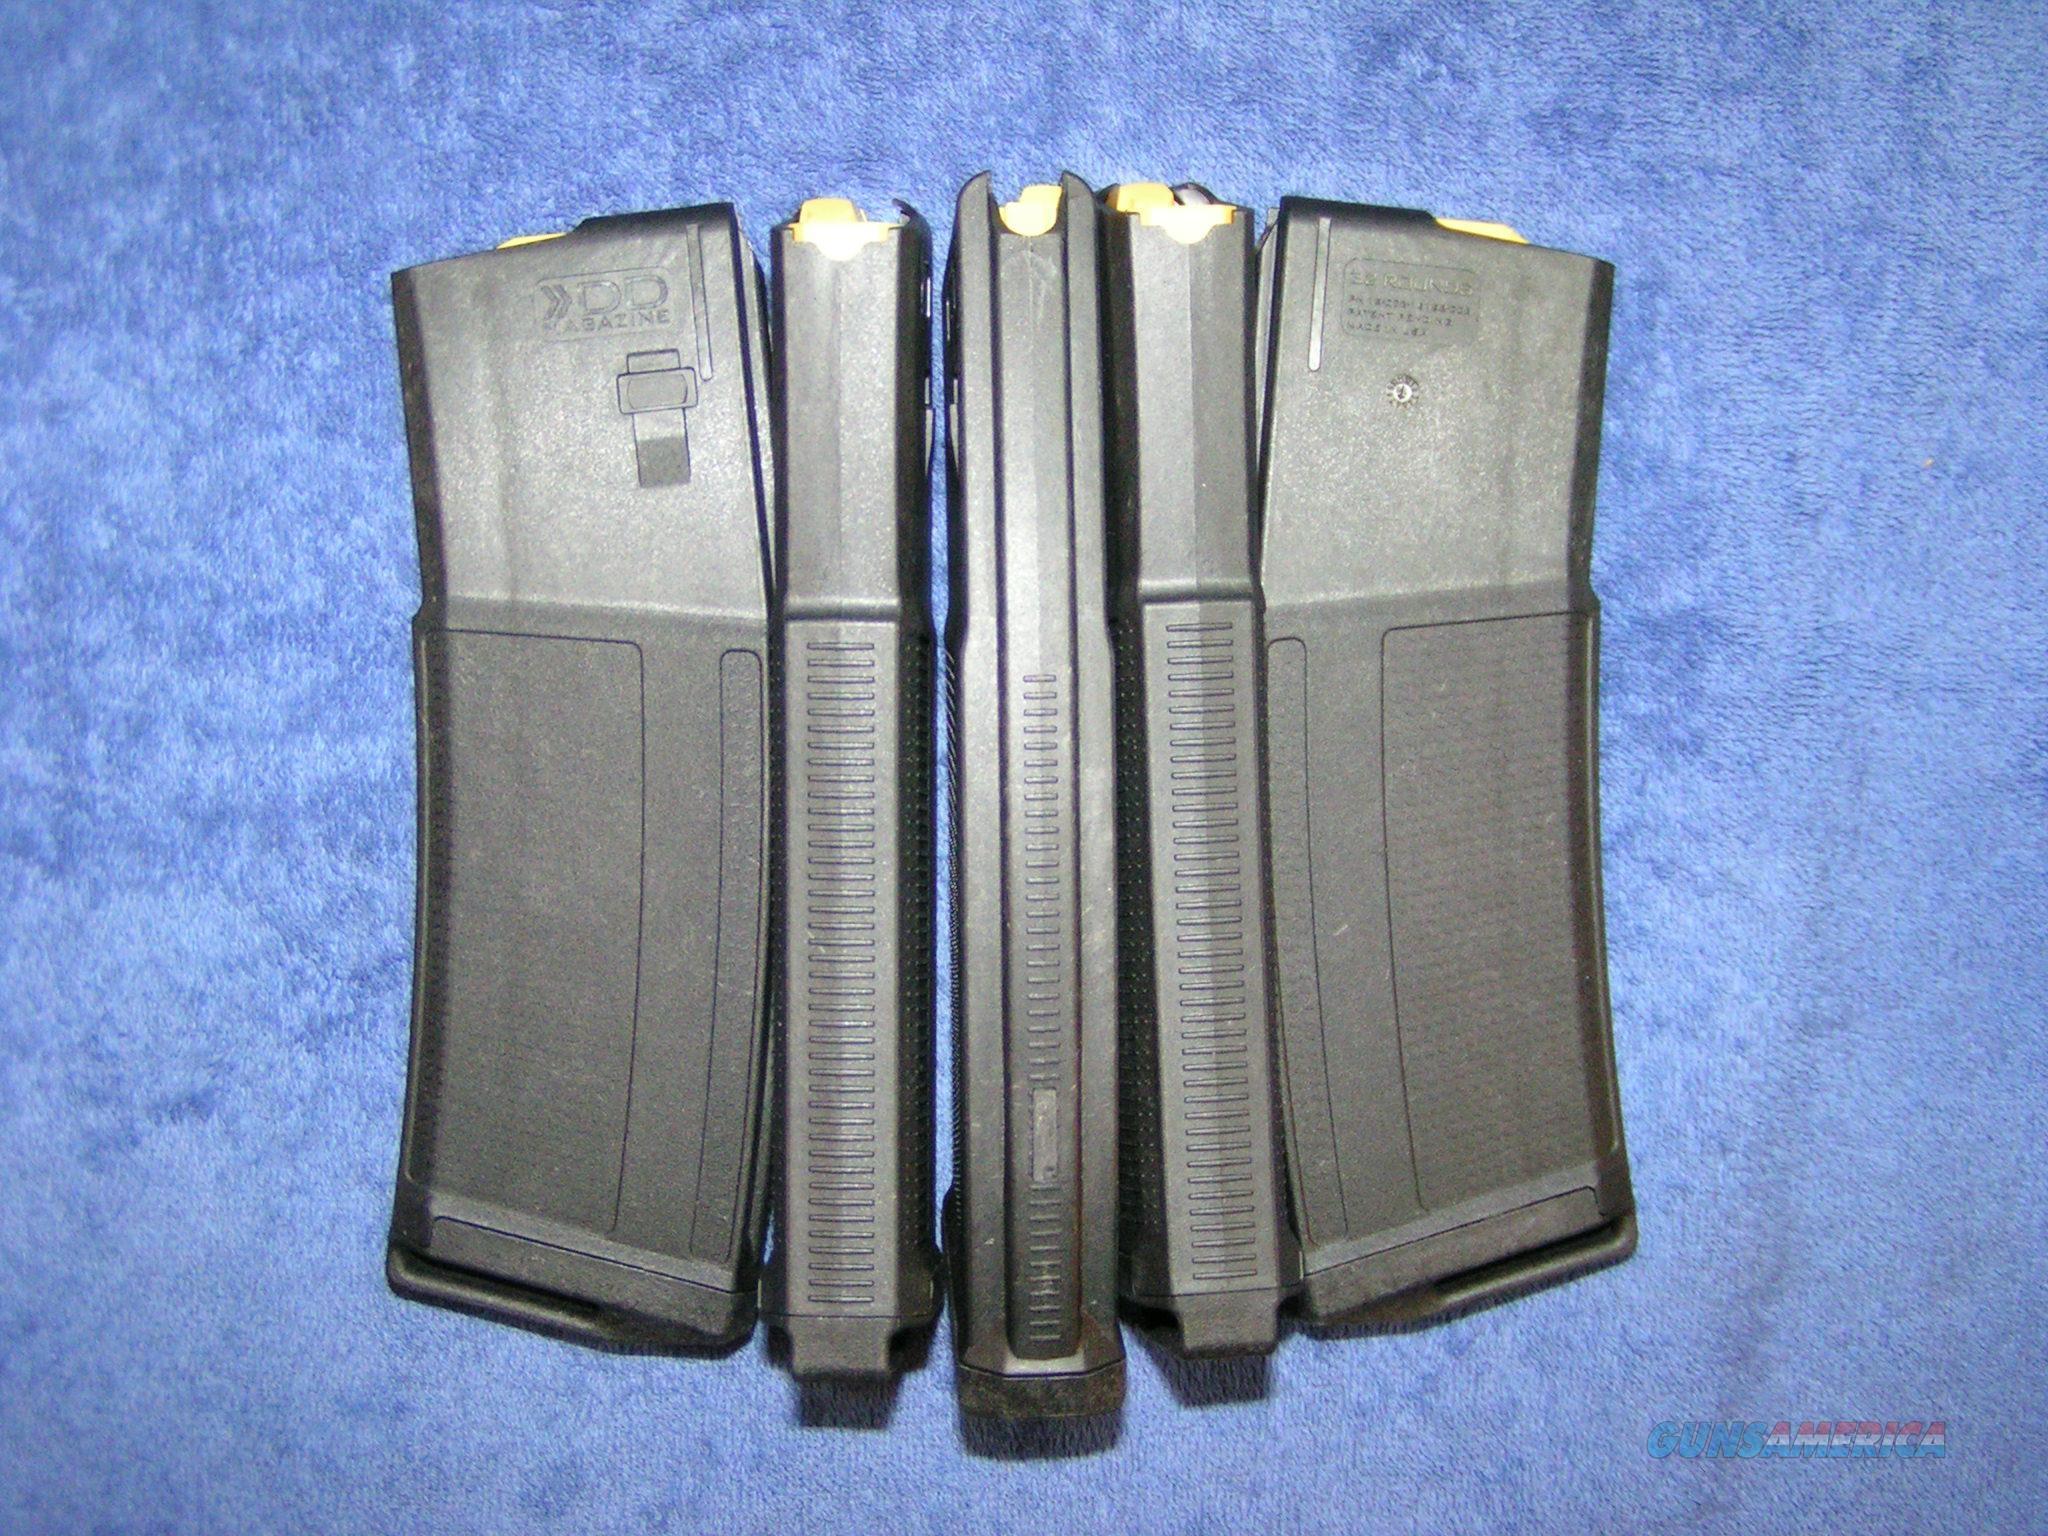 5 AR15 mags Daniel Defense 32 rd Free Ship   Non-Guns > Magazines & Clips > Rifle Magazines > AR-15 Type